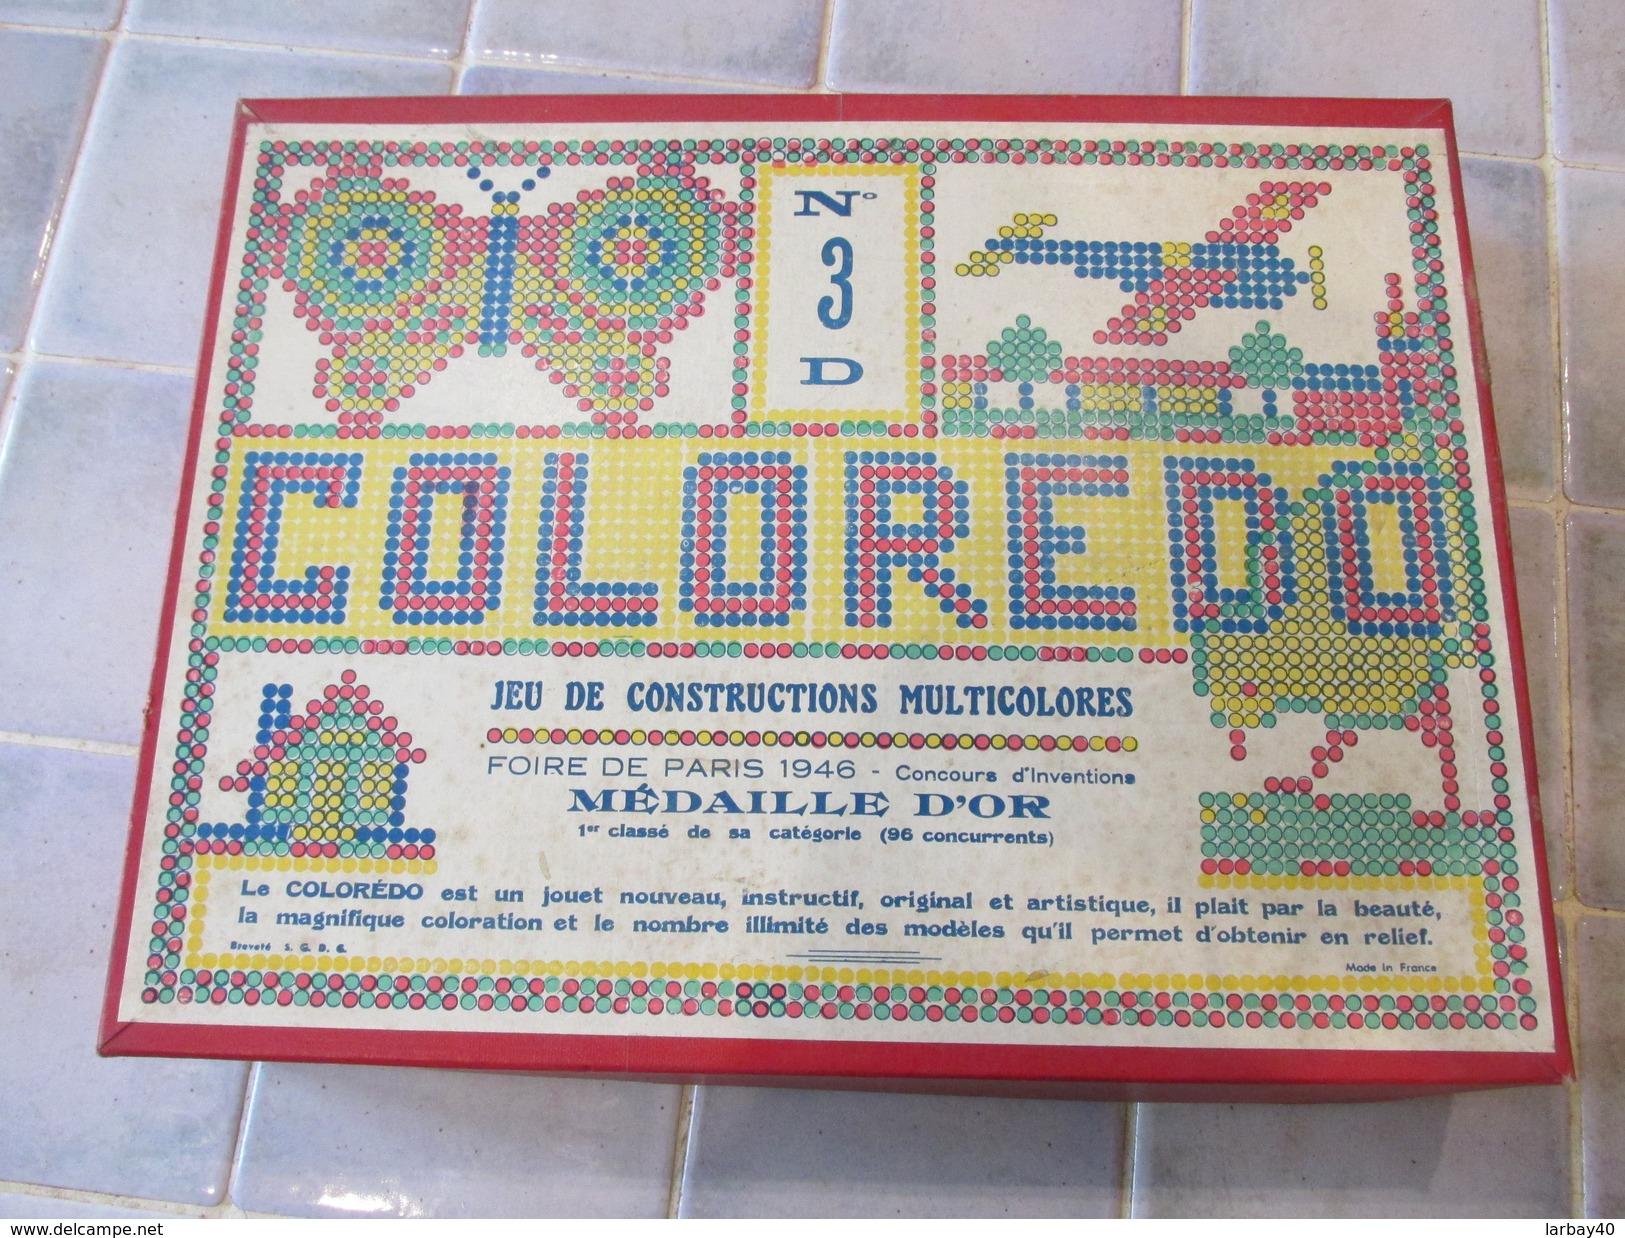 Jeu De Construction Coloredo N°3 - Other Collections